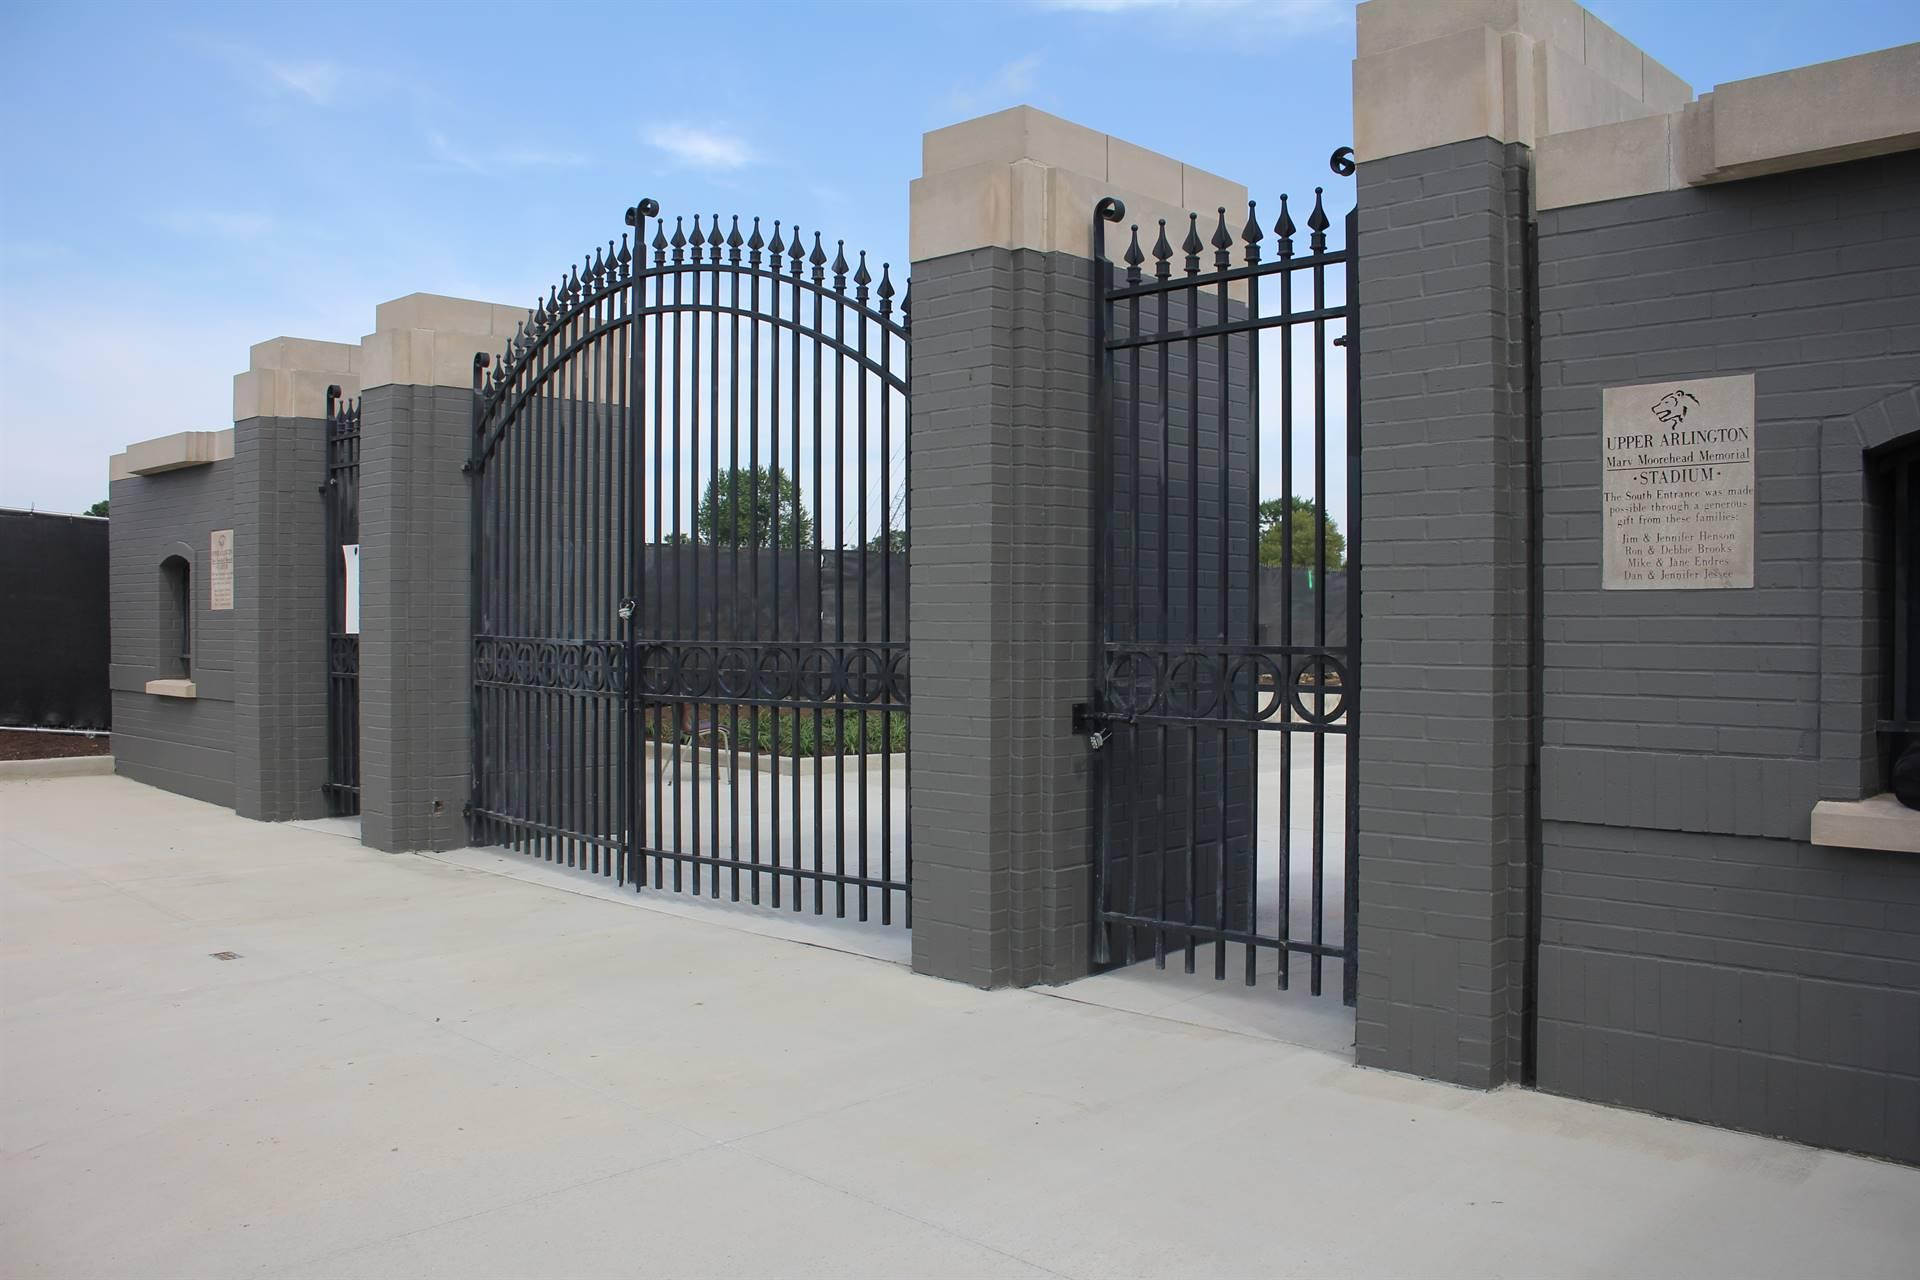 South entry gates